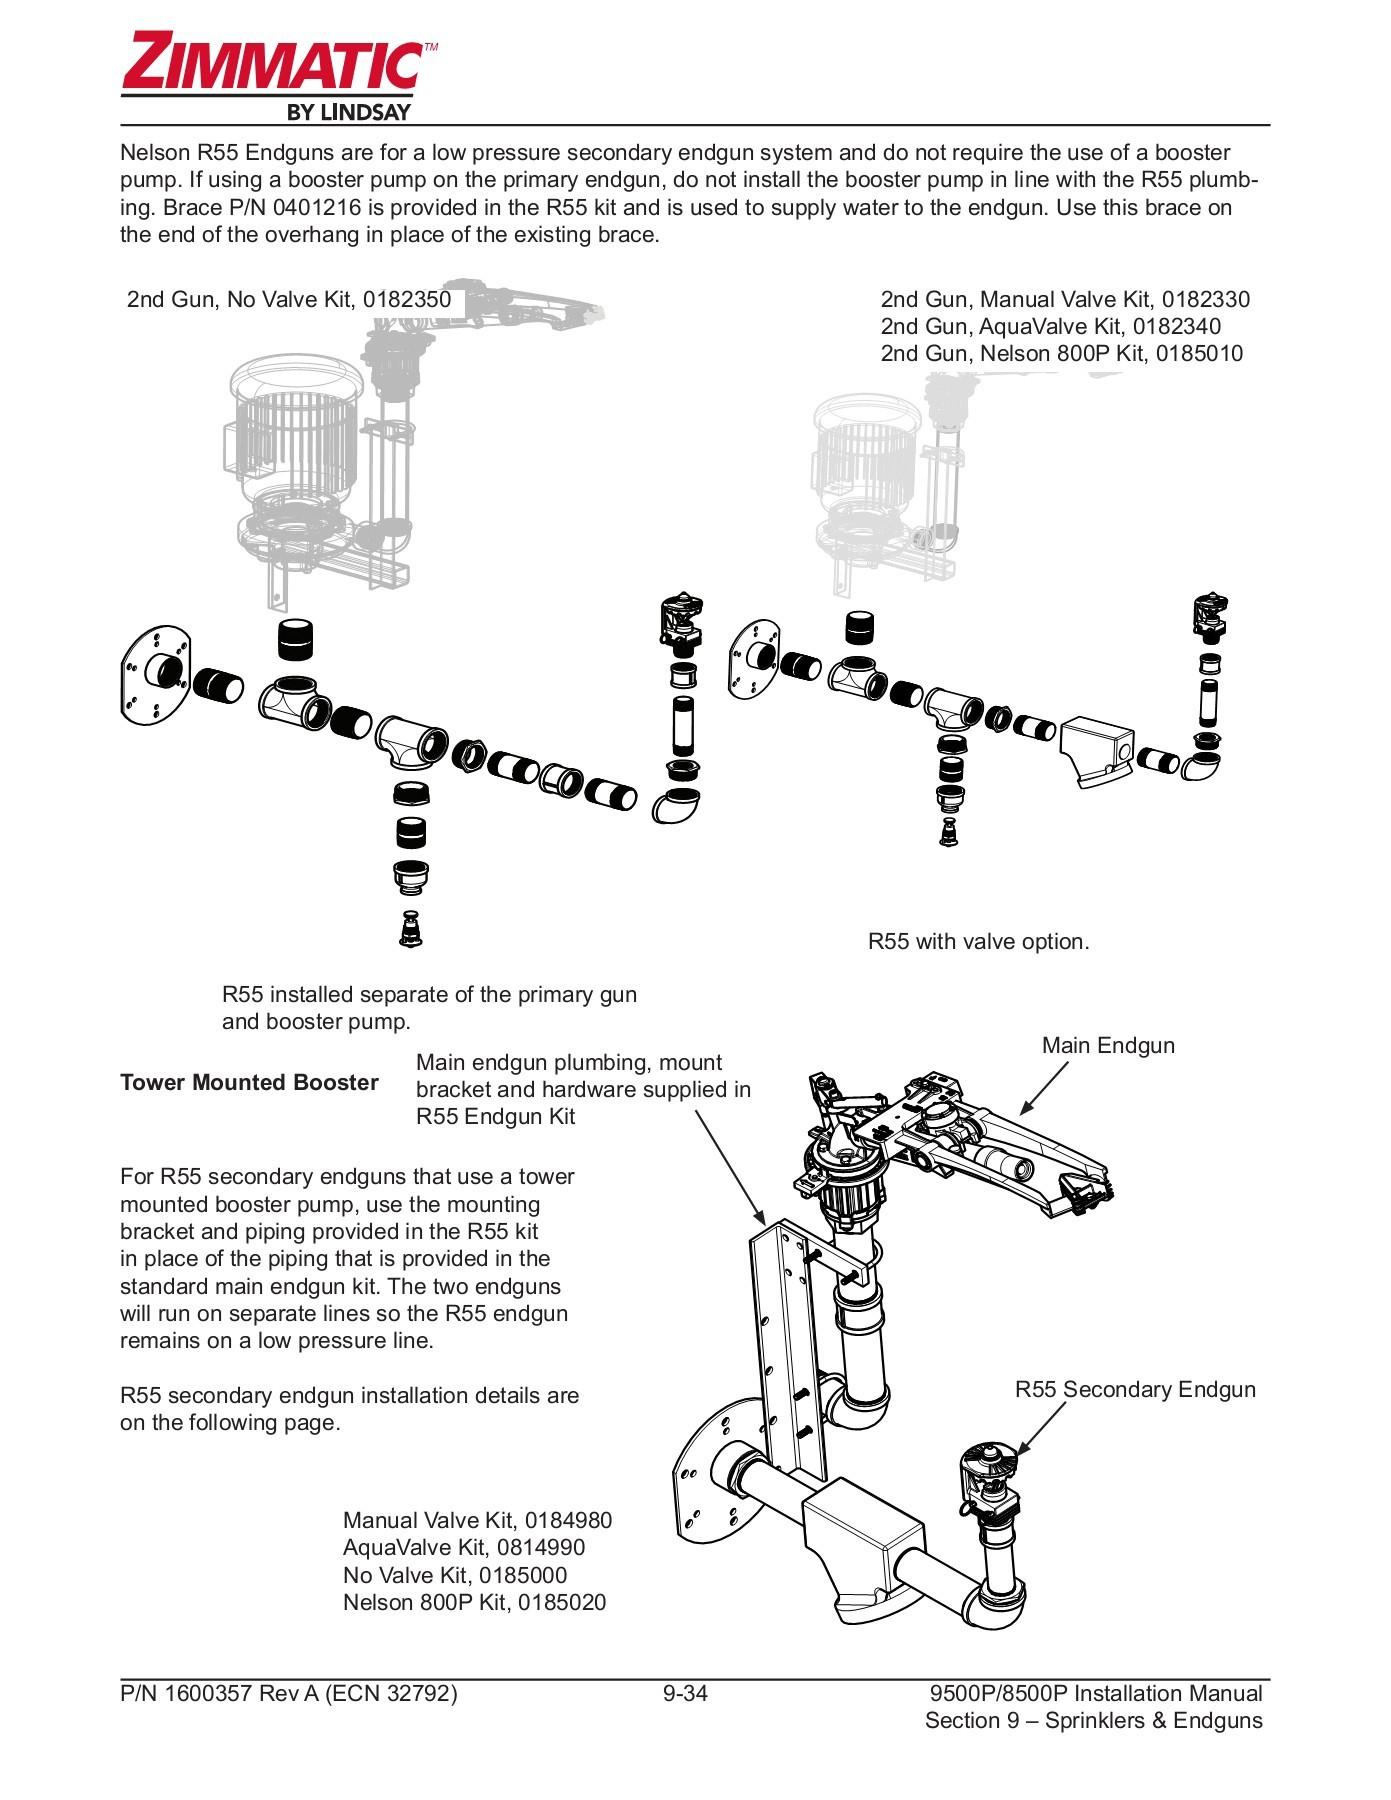 30 Zimmatic Pivot Wiring Diagram